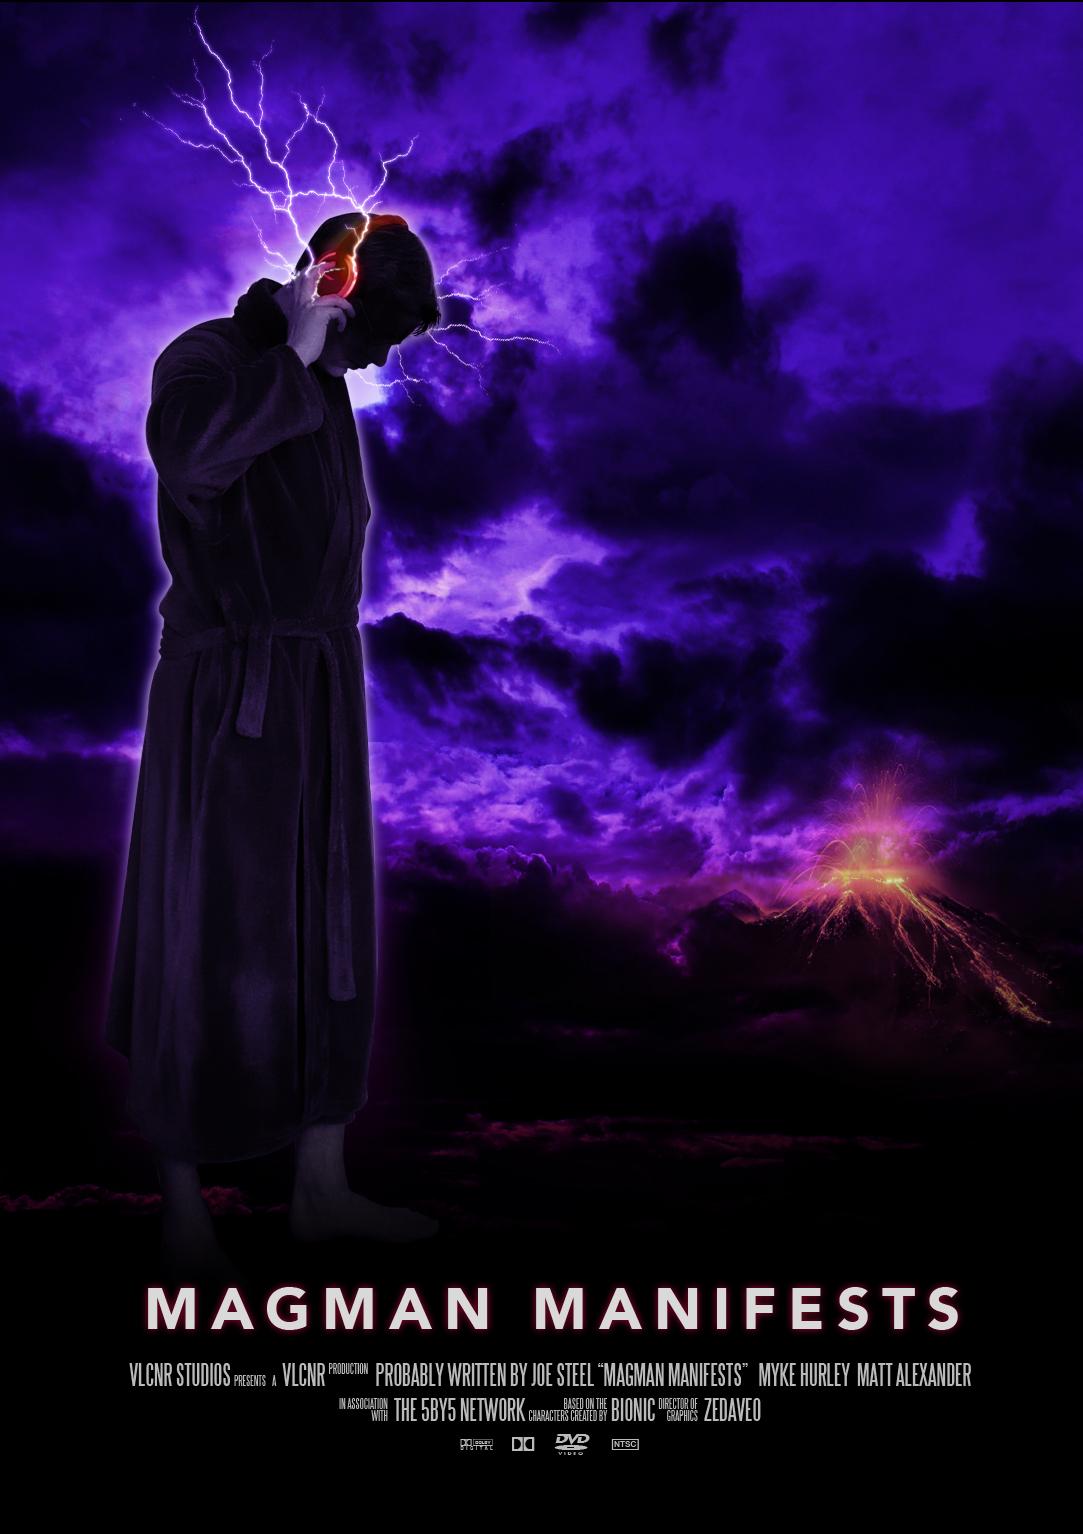 MagmanManifests.jpg